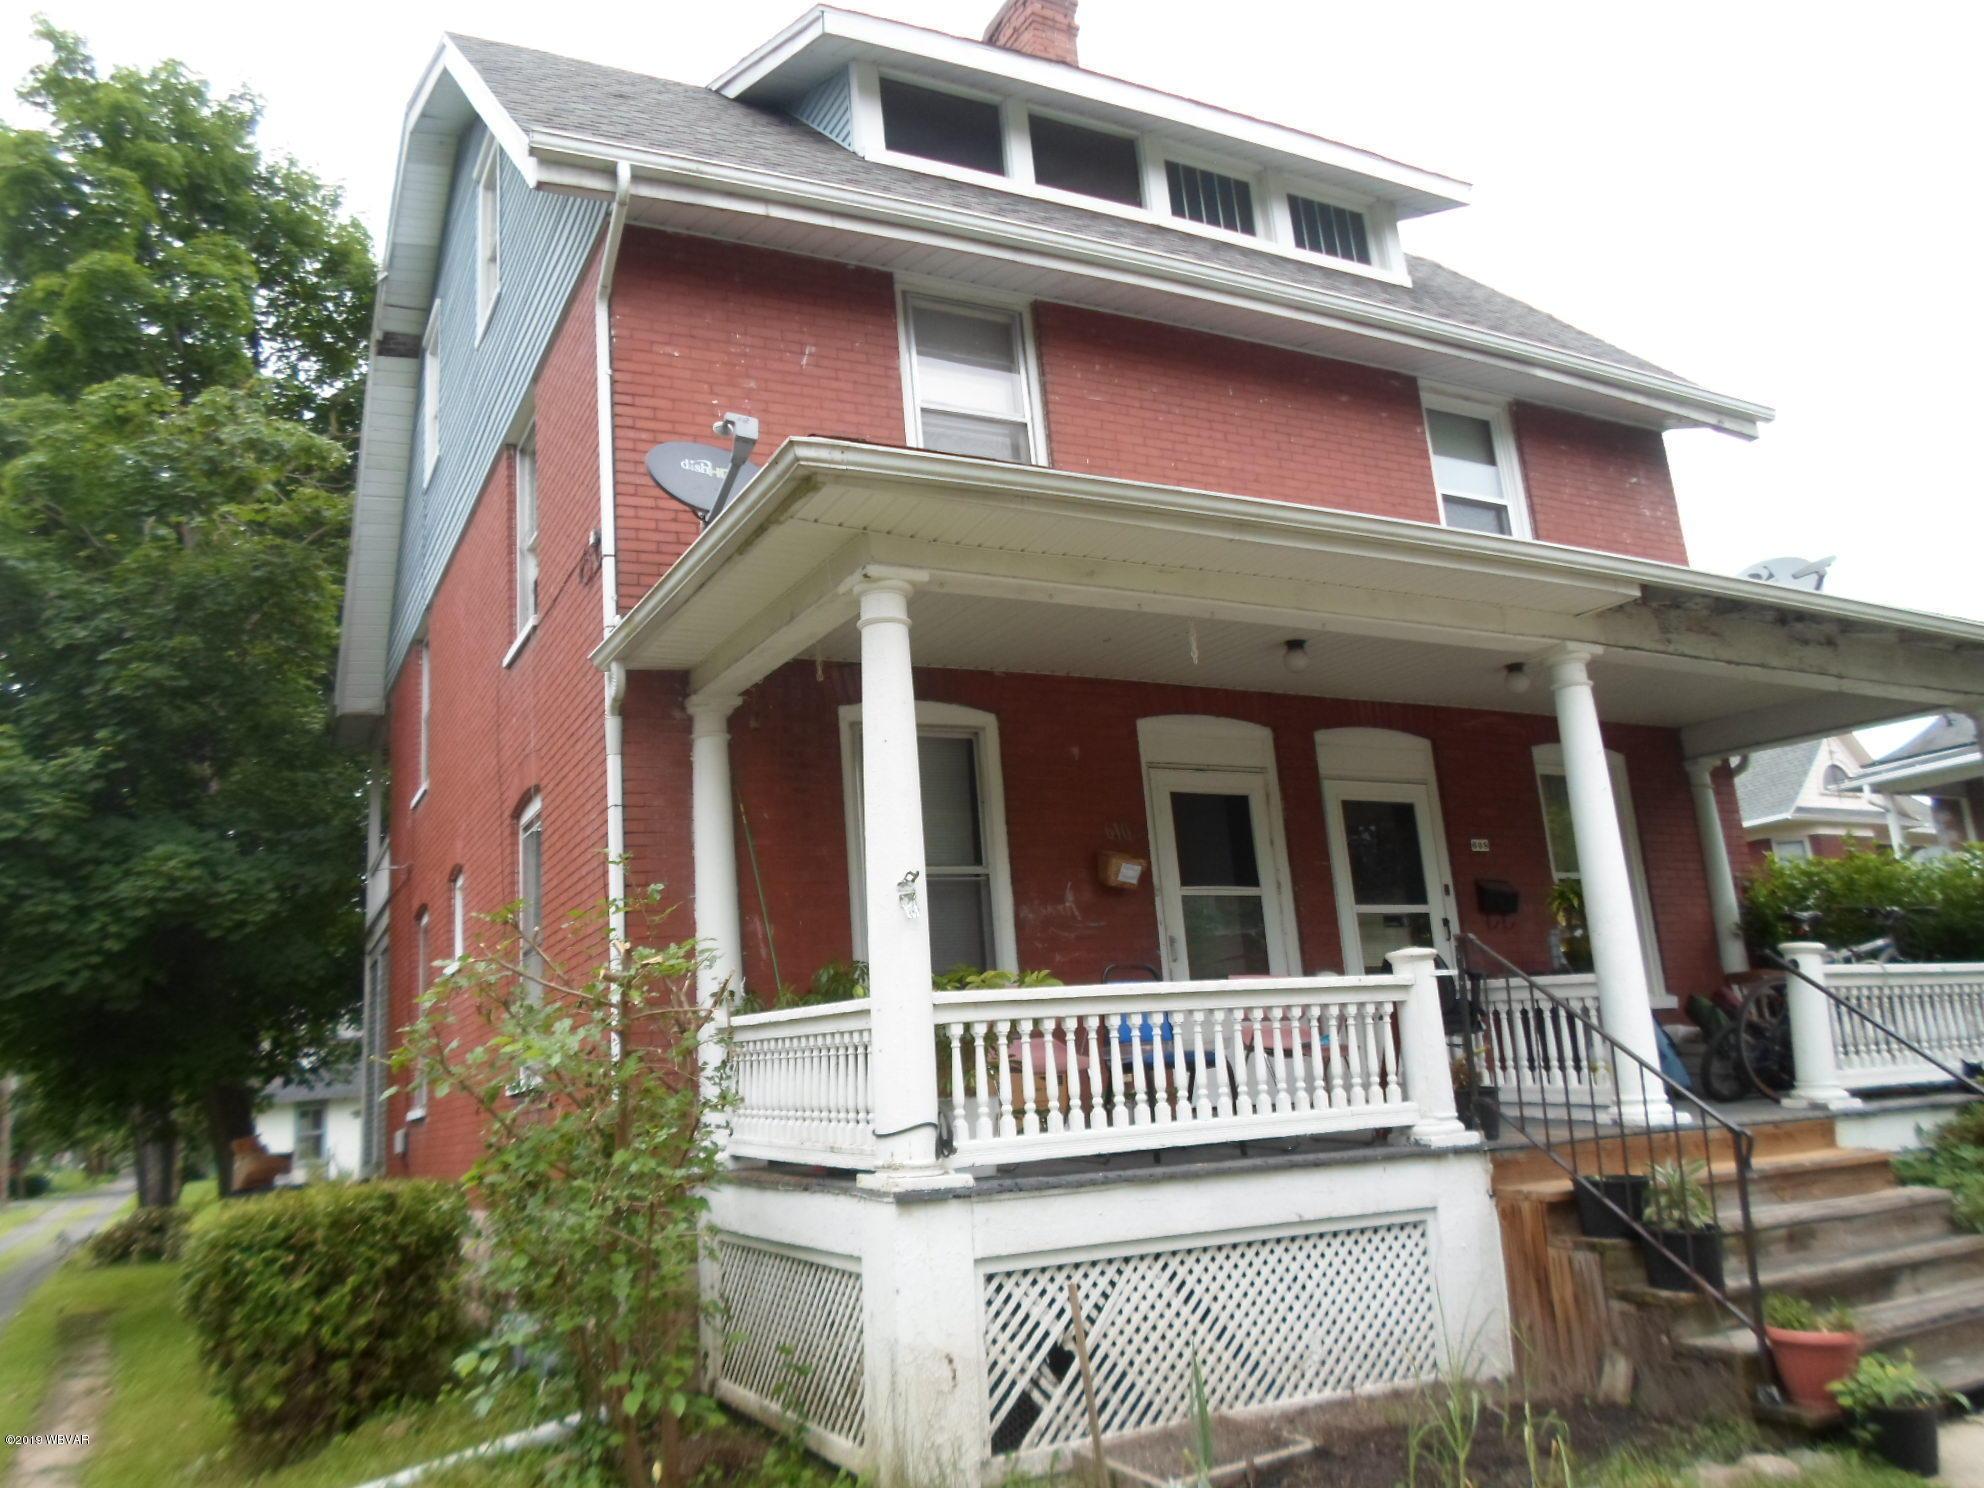 610 GLENWOOD AVENUE,Williamsport,PA 17701,4 Bedrooms Bedrooms,1 BathroomBathrooms,Residential,GLENWOOD,WB-87629